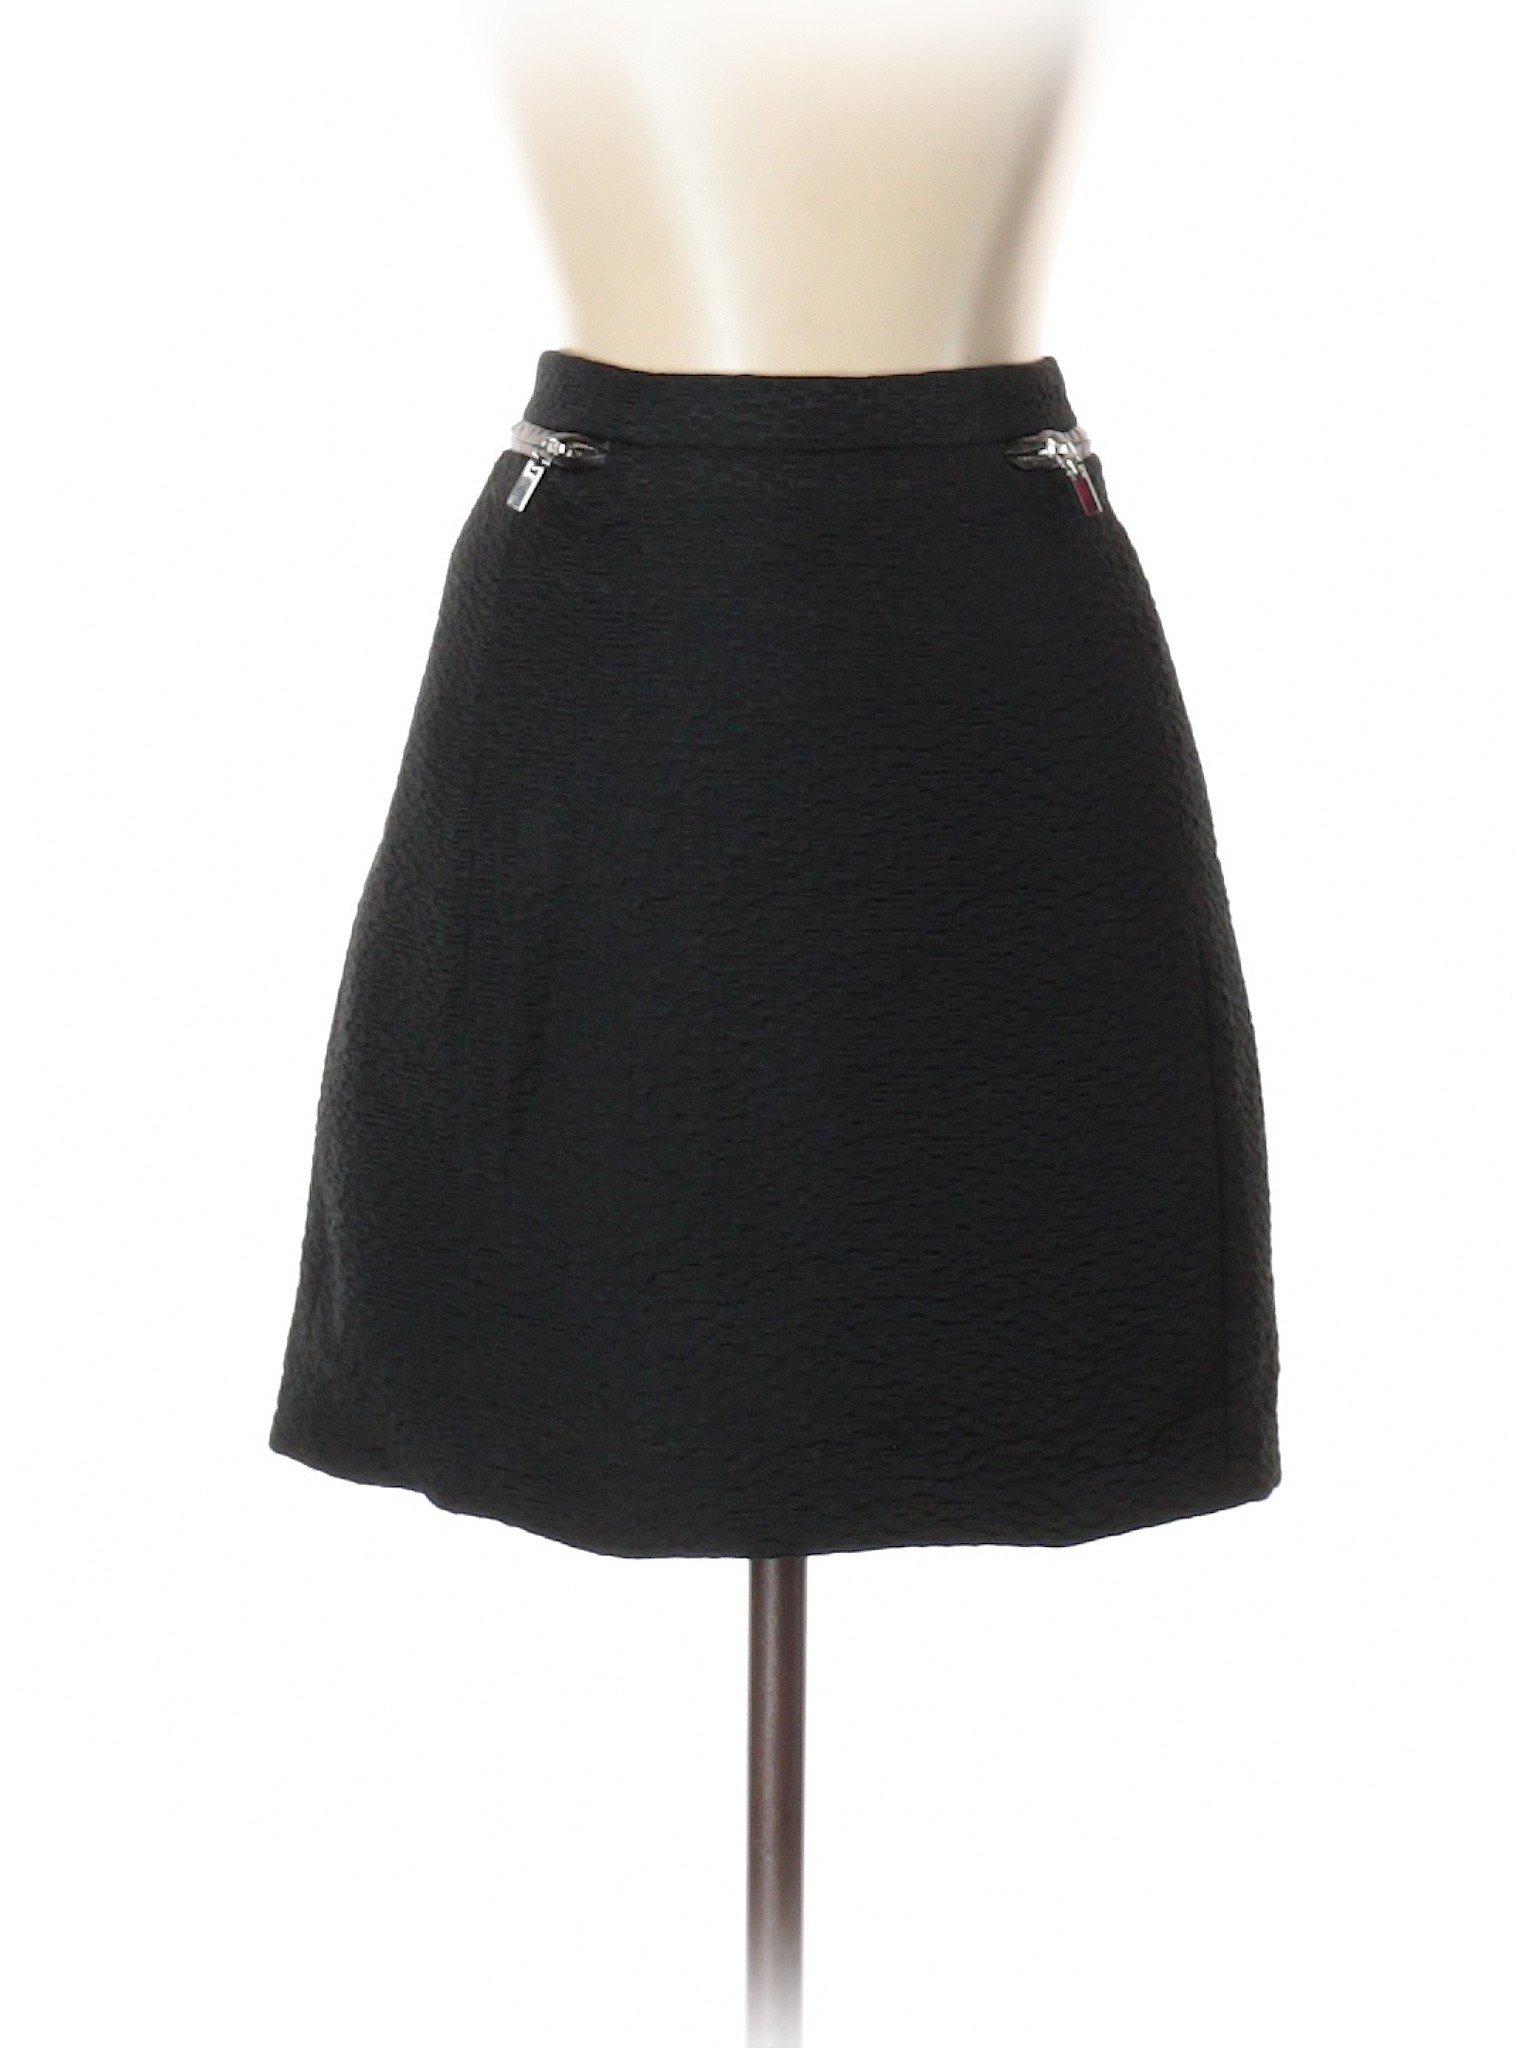 Boutique Boutique Casual Skirt Casual Skirt Boutique Boutique Casual Skirt qqpwFx85r